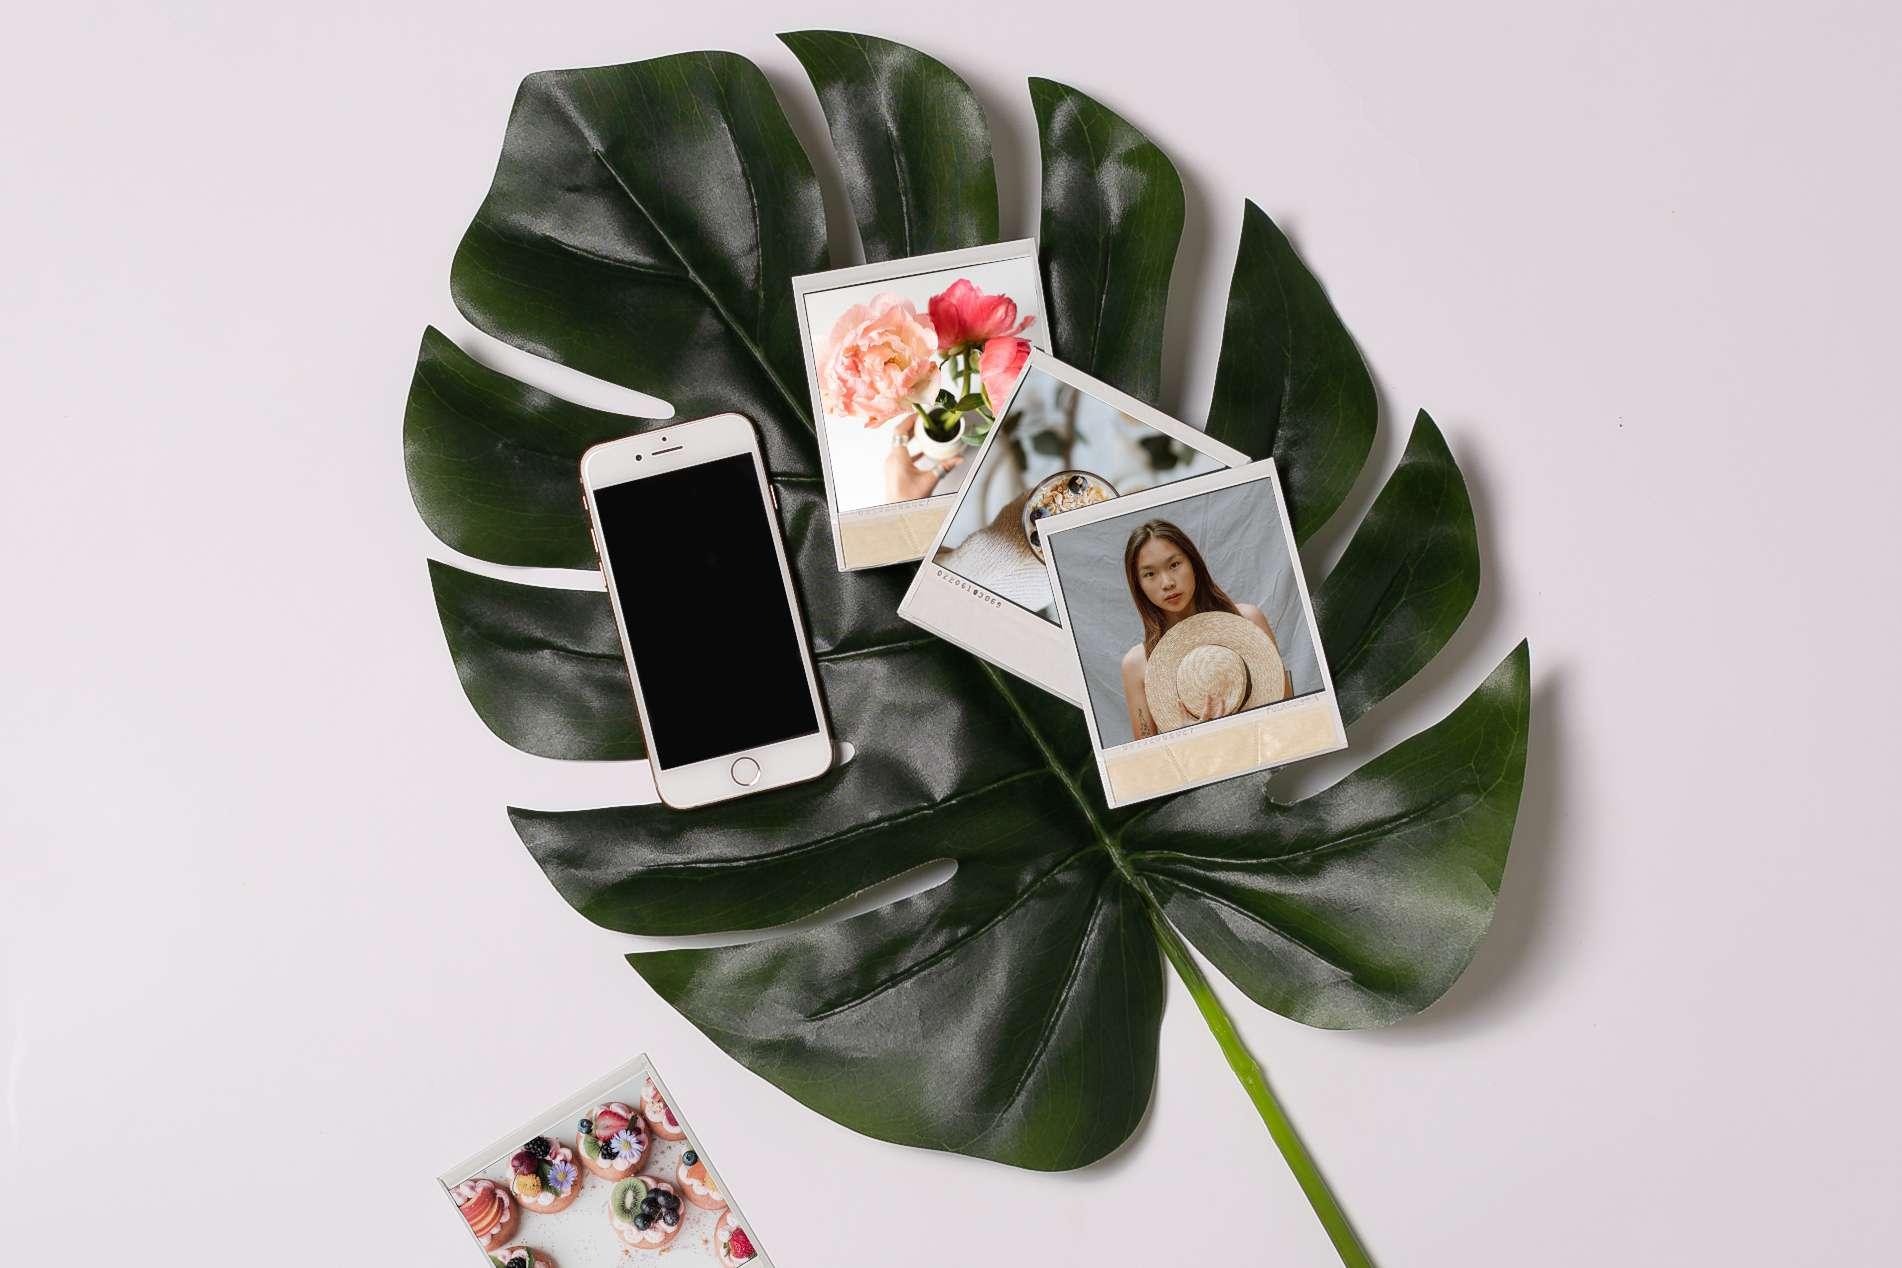 smartphone and polaroid prints